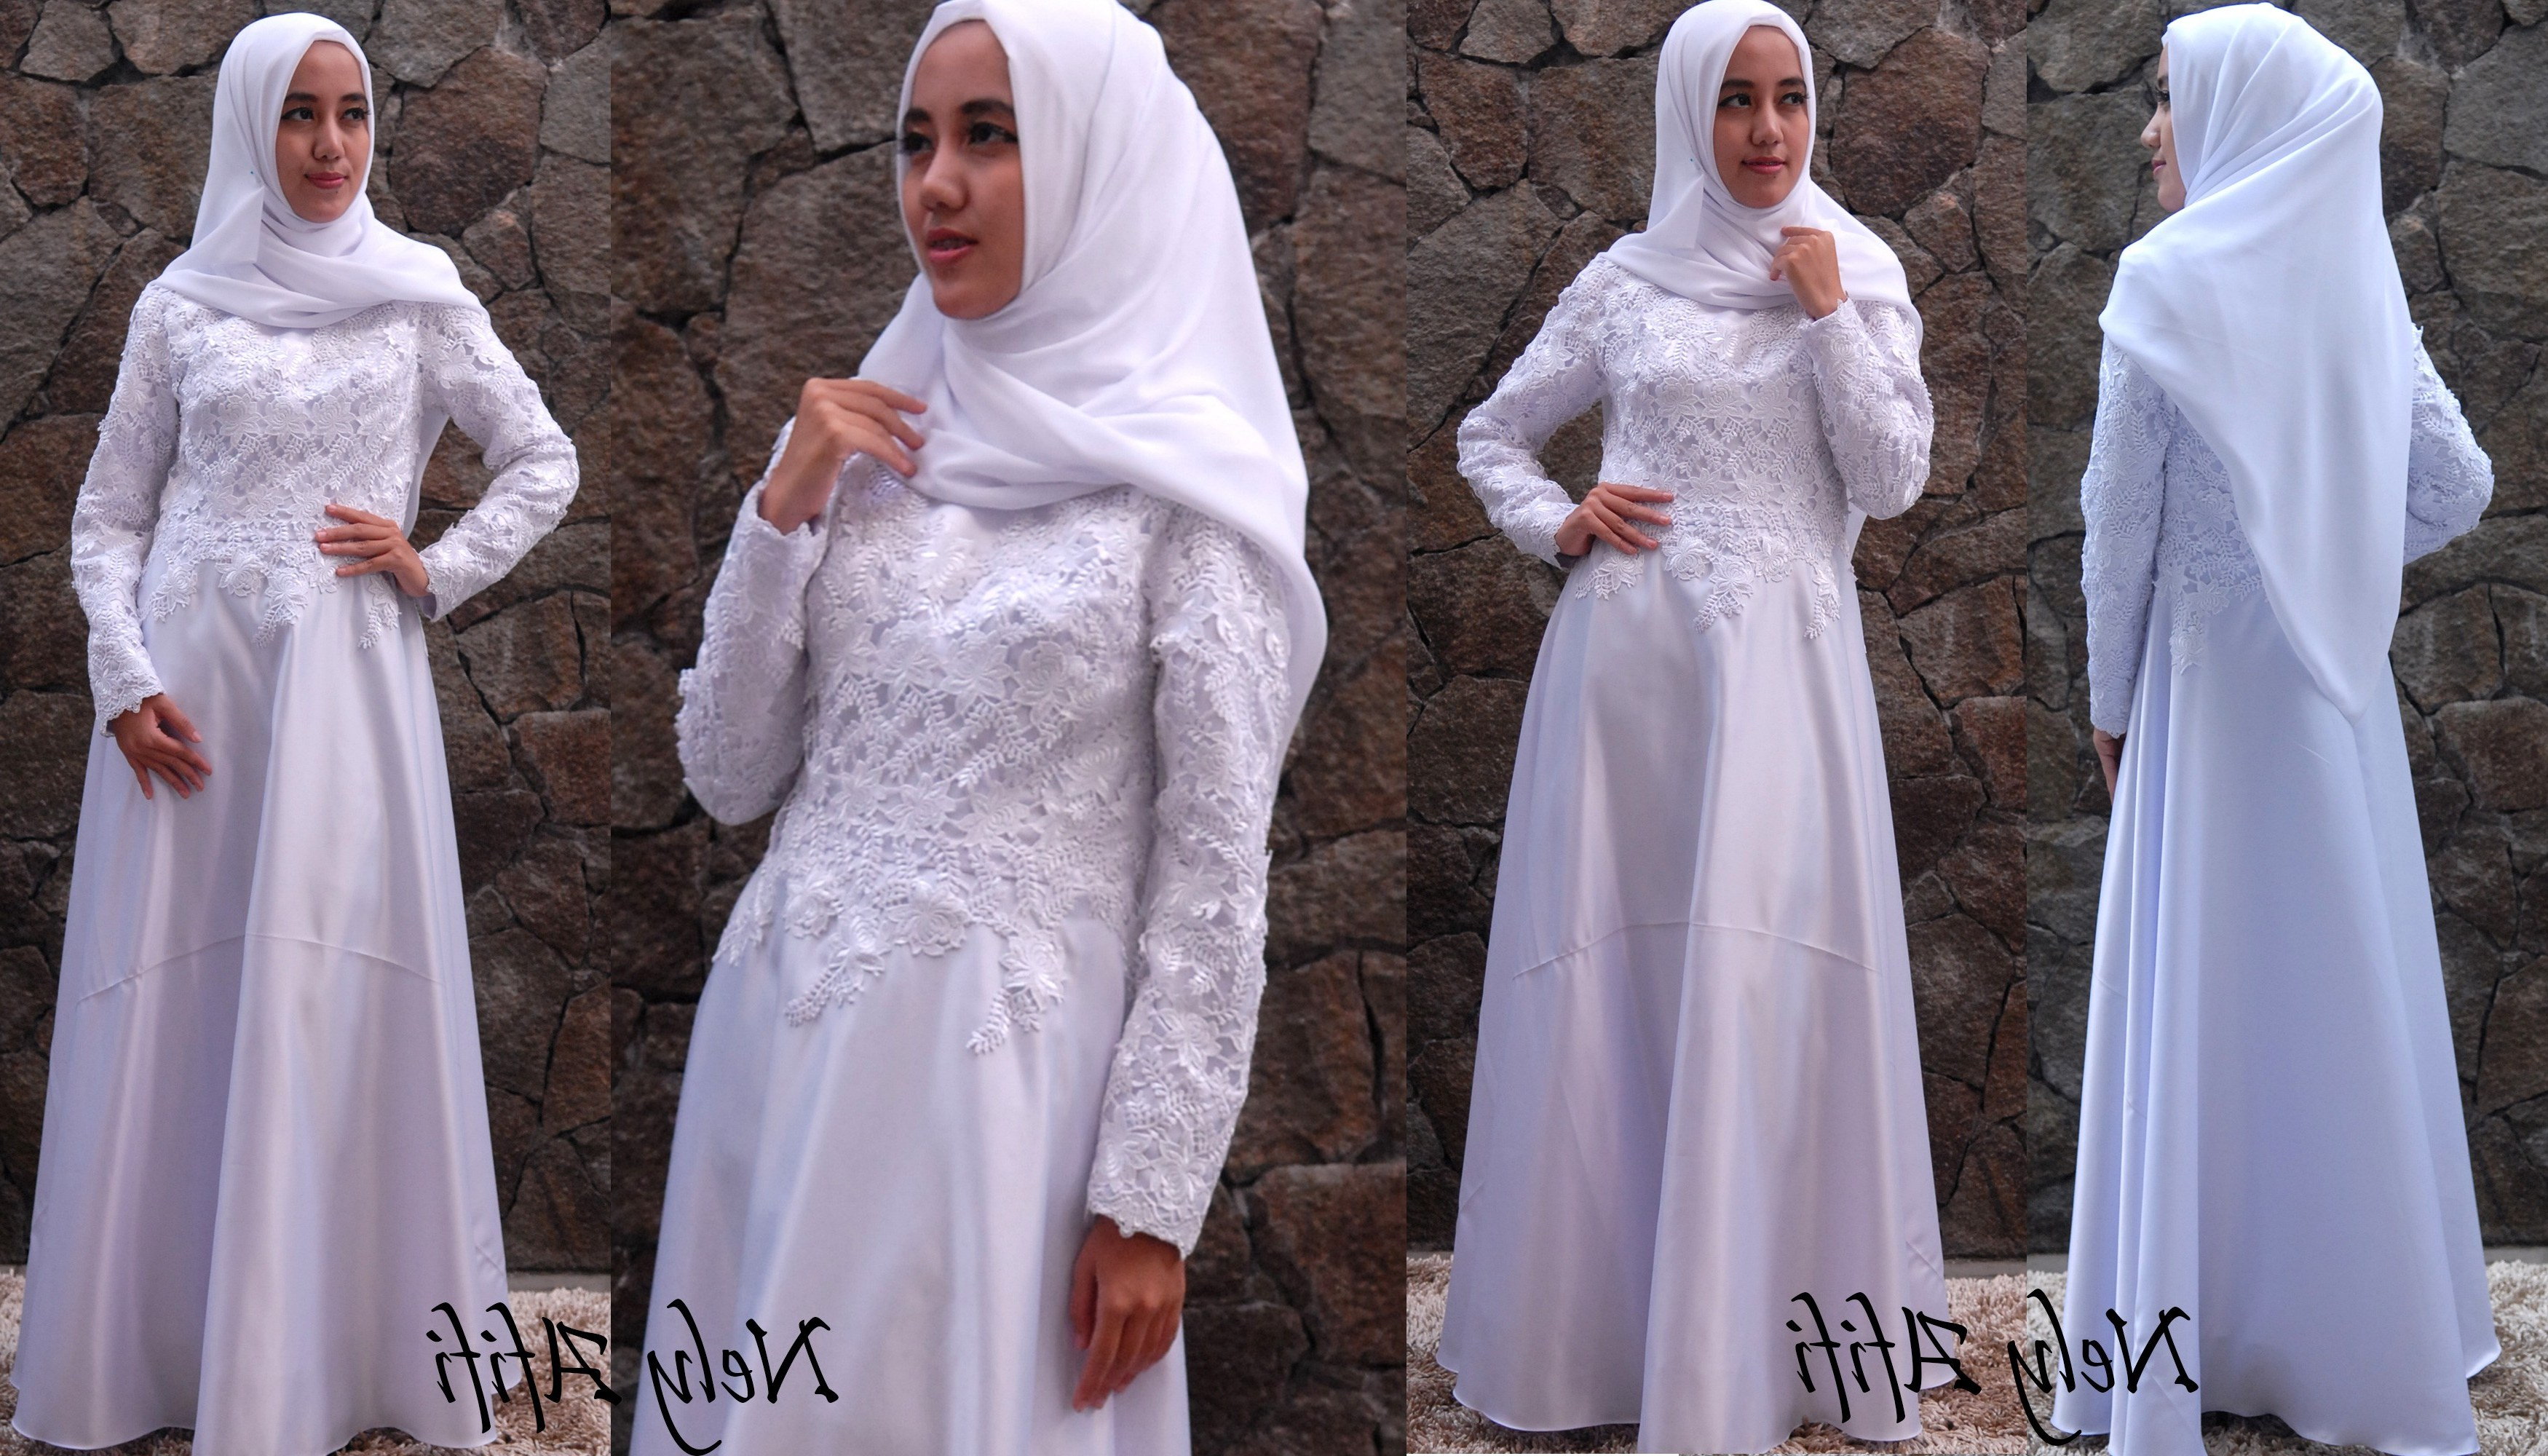 Model Gaun Muslimah Pengantin J7do Pengantin Muslimah Terbaik Gaun Pengantin Hijab Warna Putih